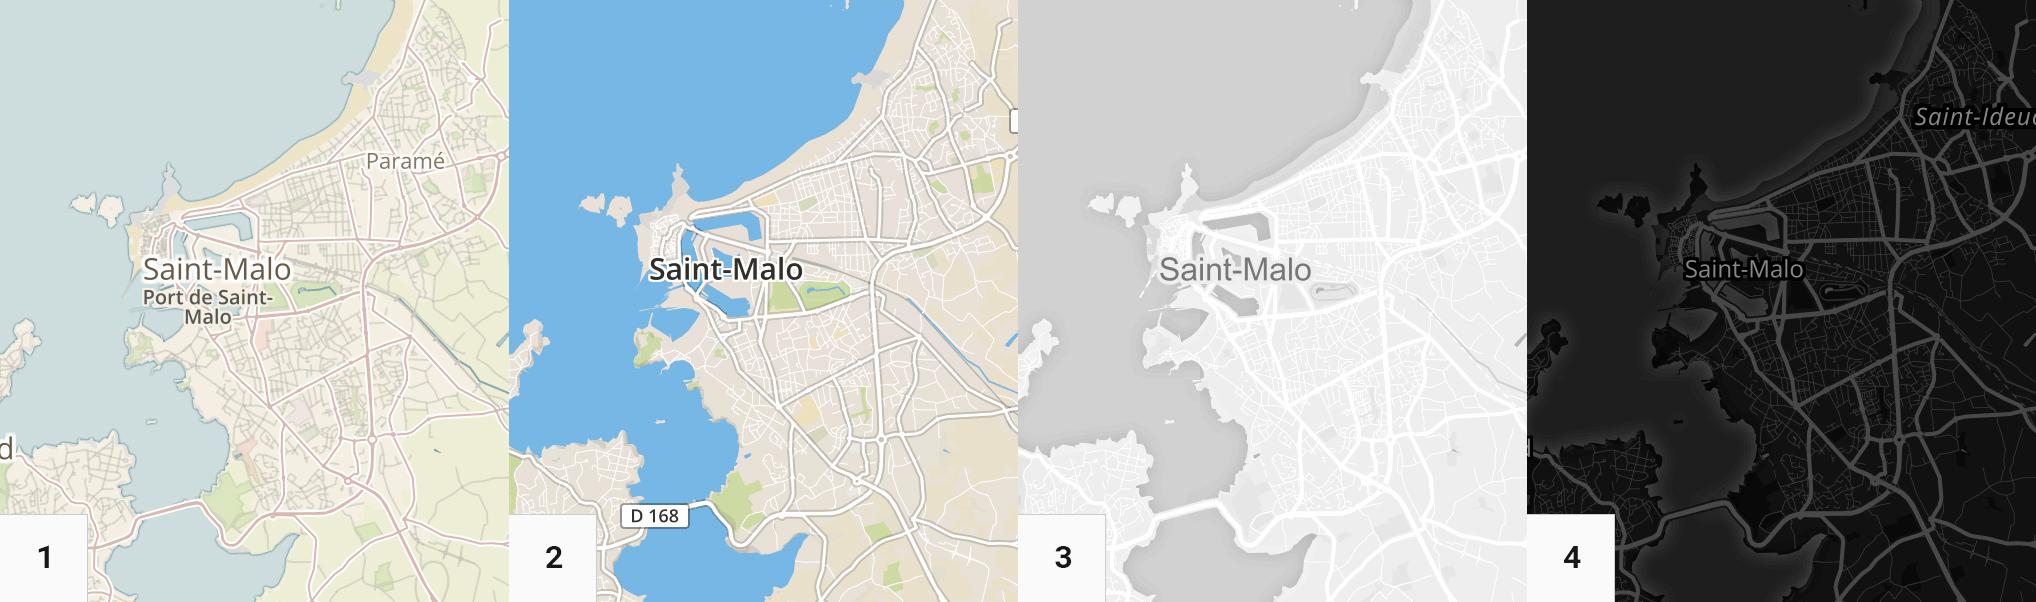 tiles-mapbox-2